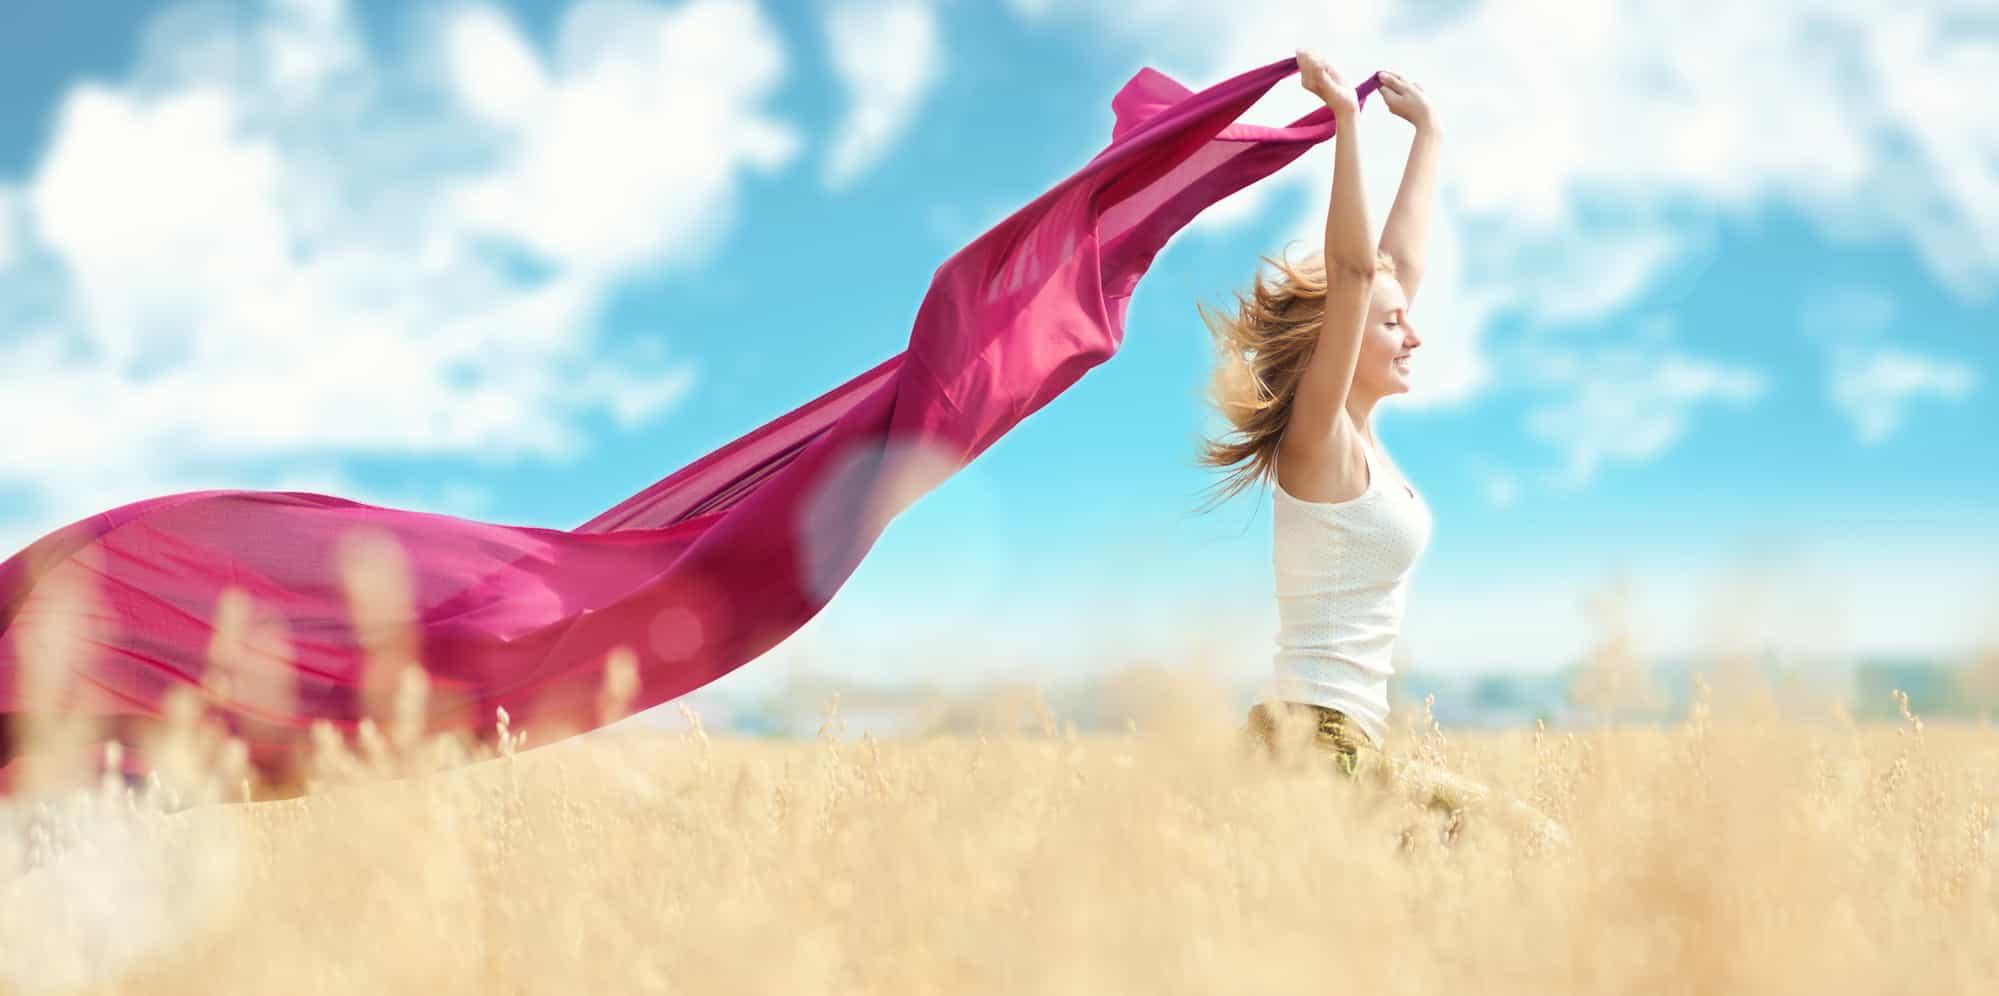 Happy woman on picnic in wheat field